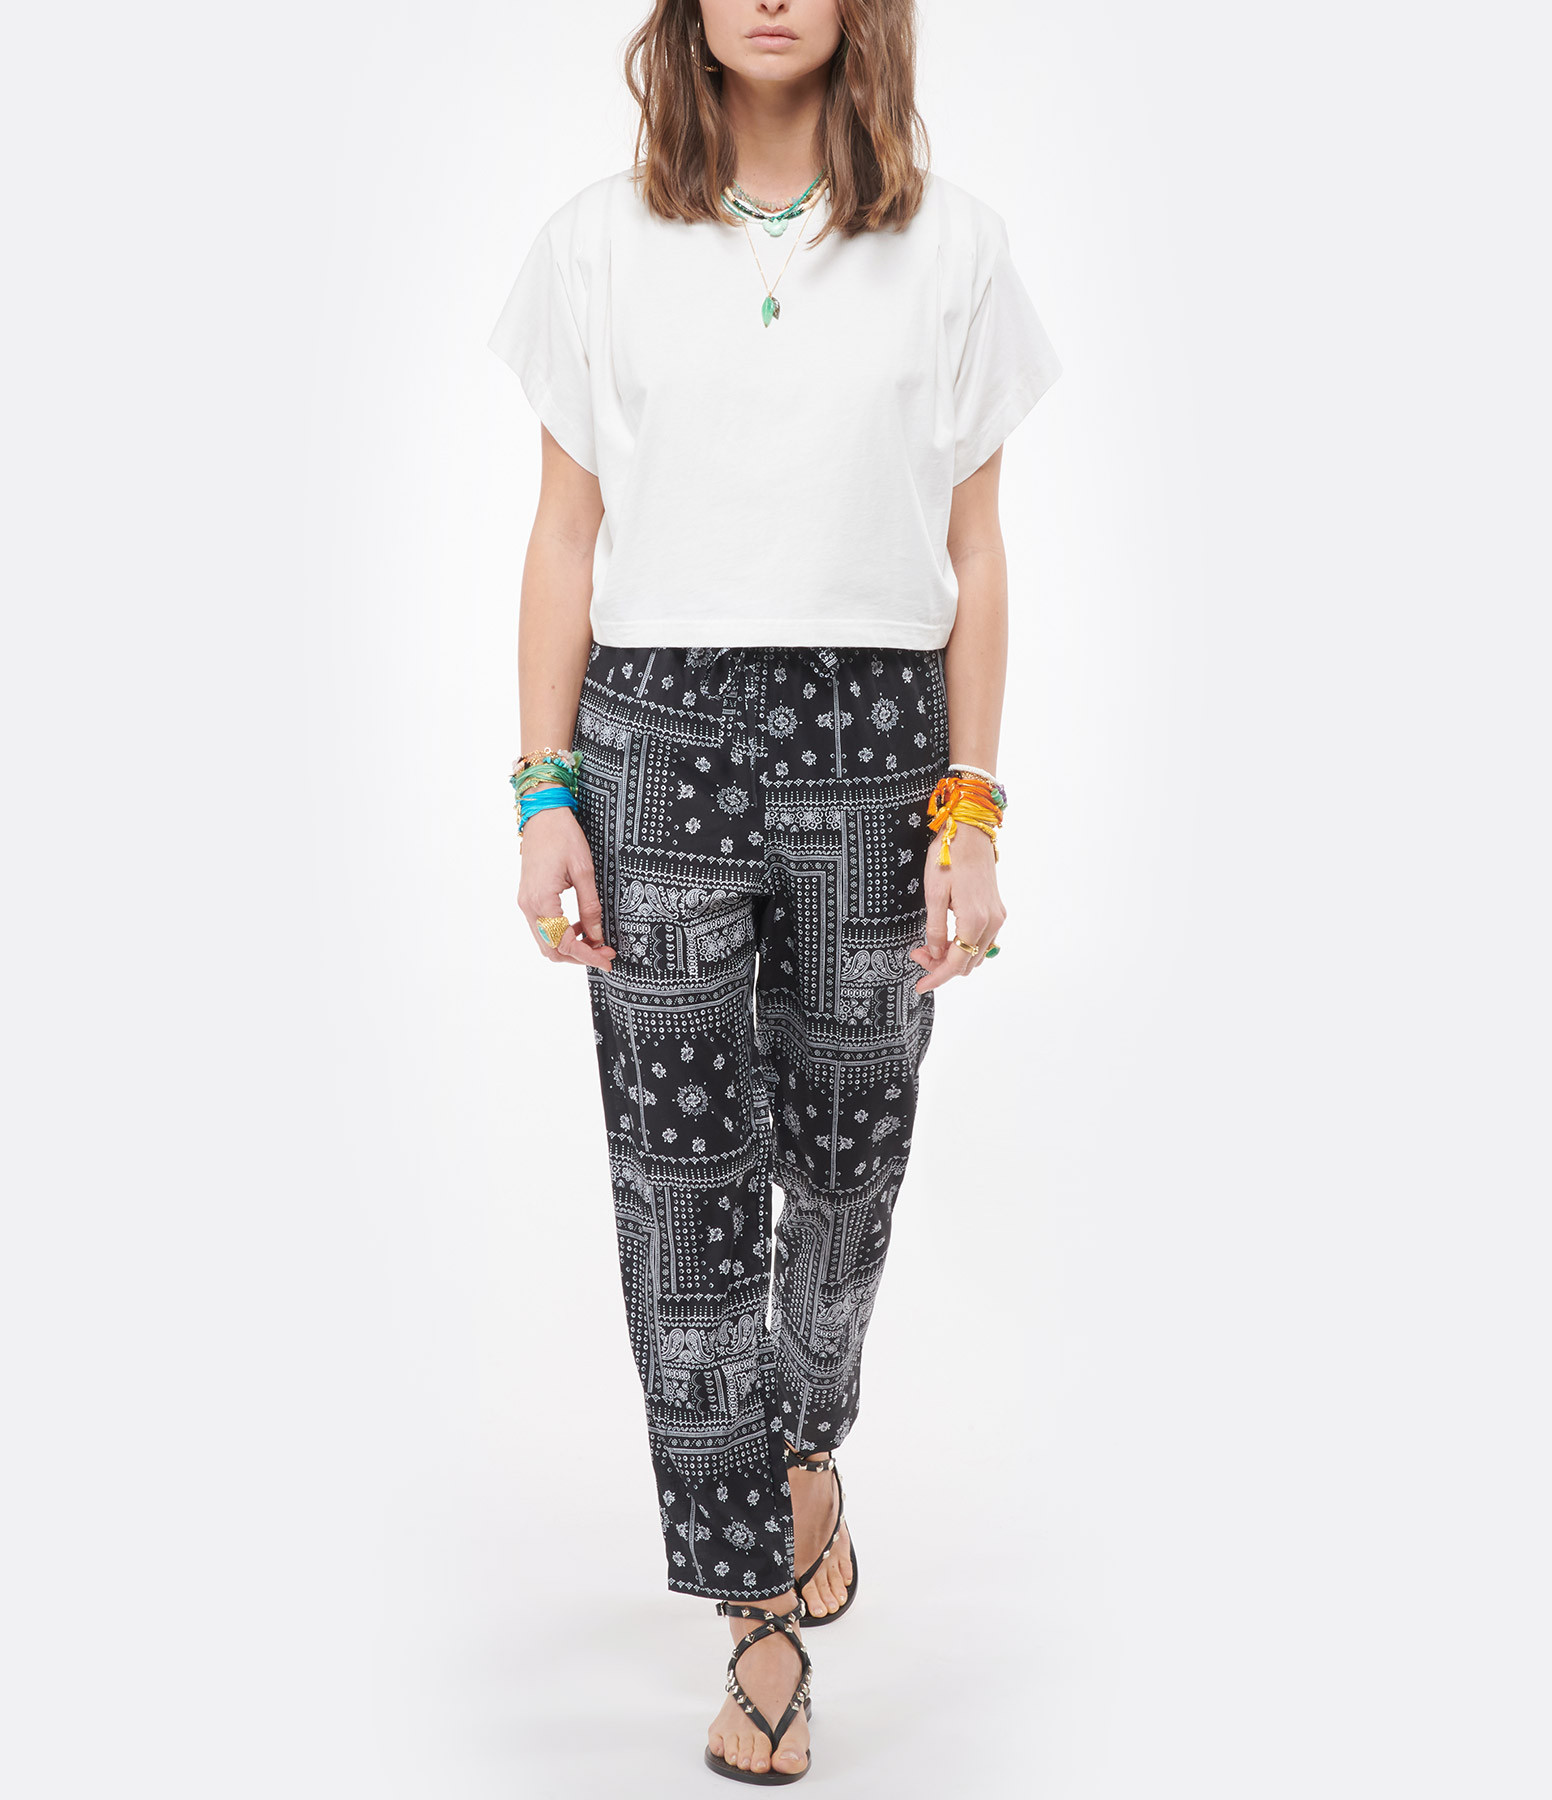 JEANNE VOULAND - Pantalon Maha Paisley Bandana Noir Blanc